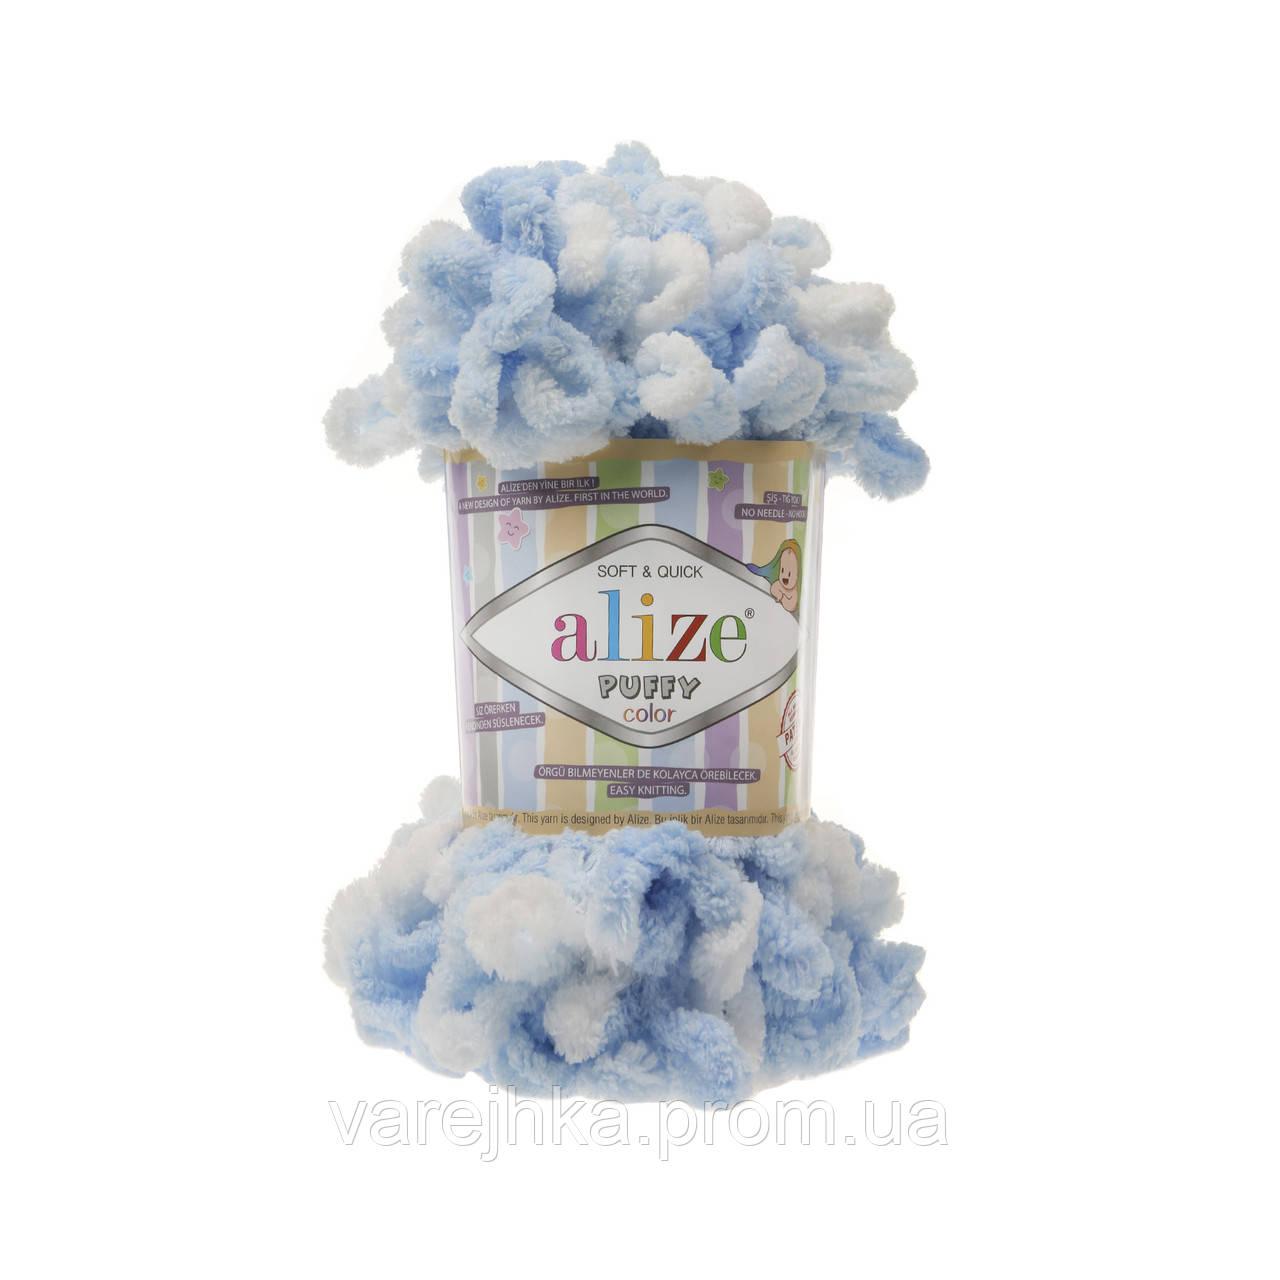 пряжа для вязания руками Alize Puffy Color 5865 ализе пуфи колор